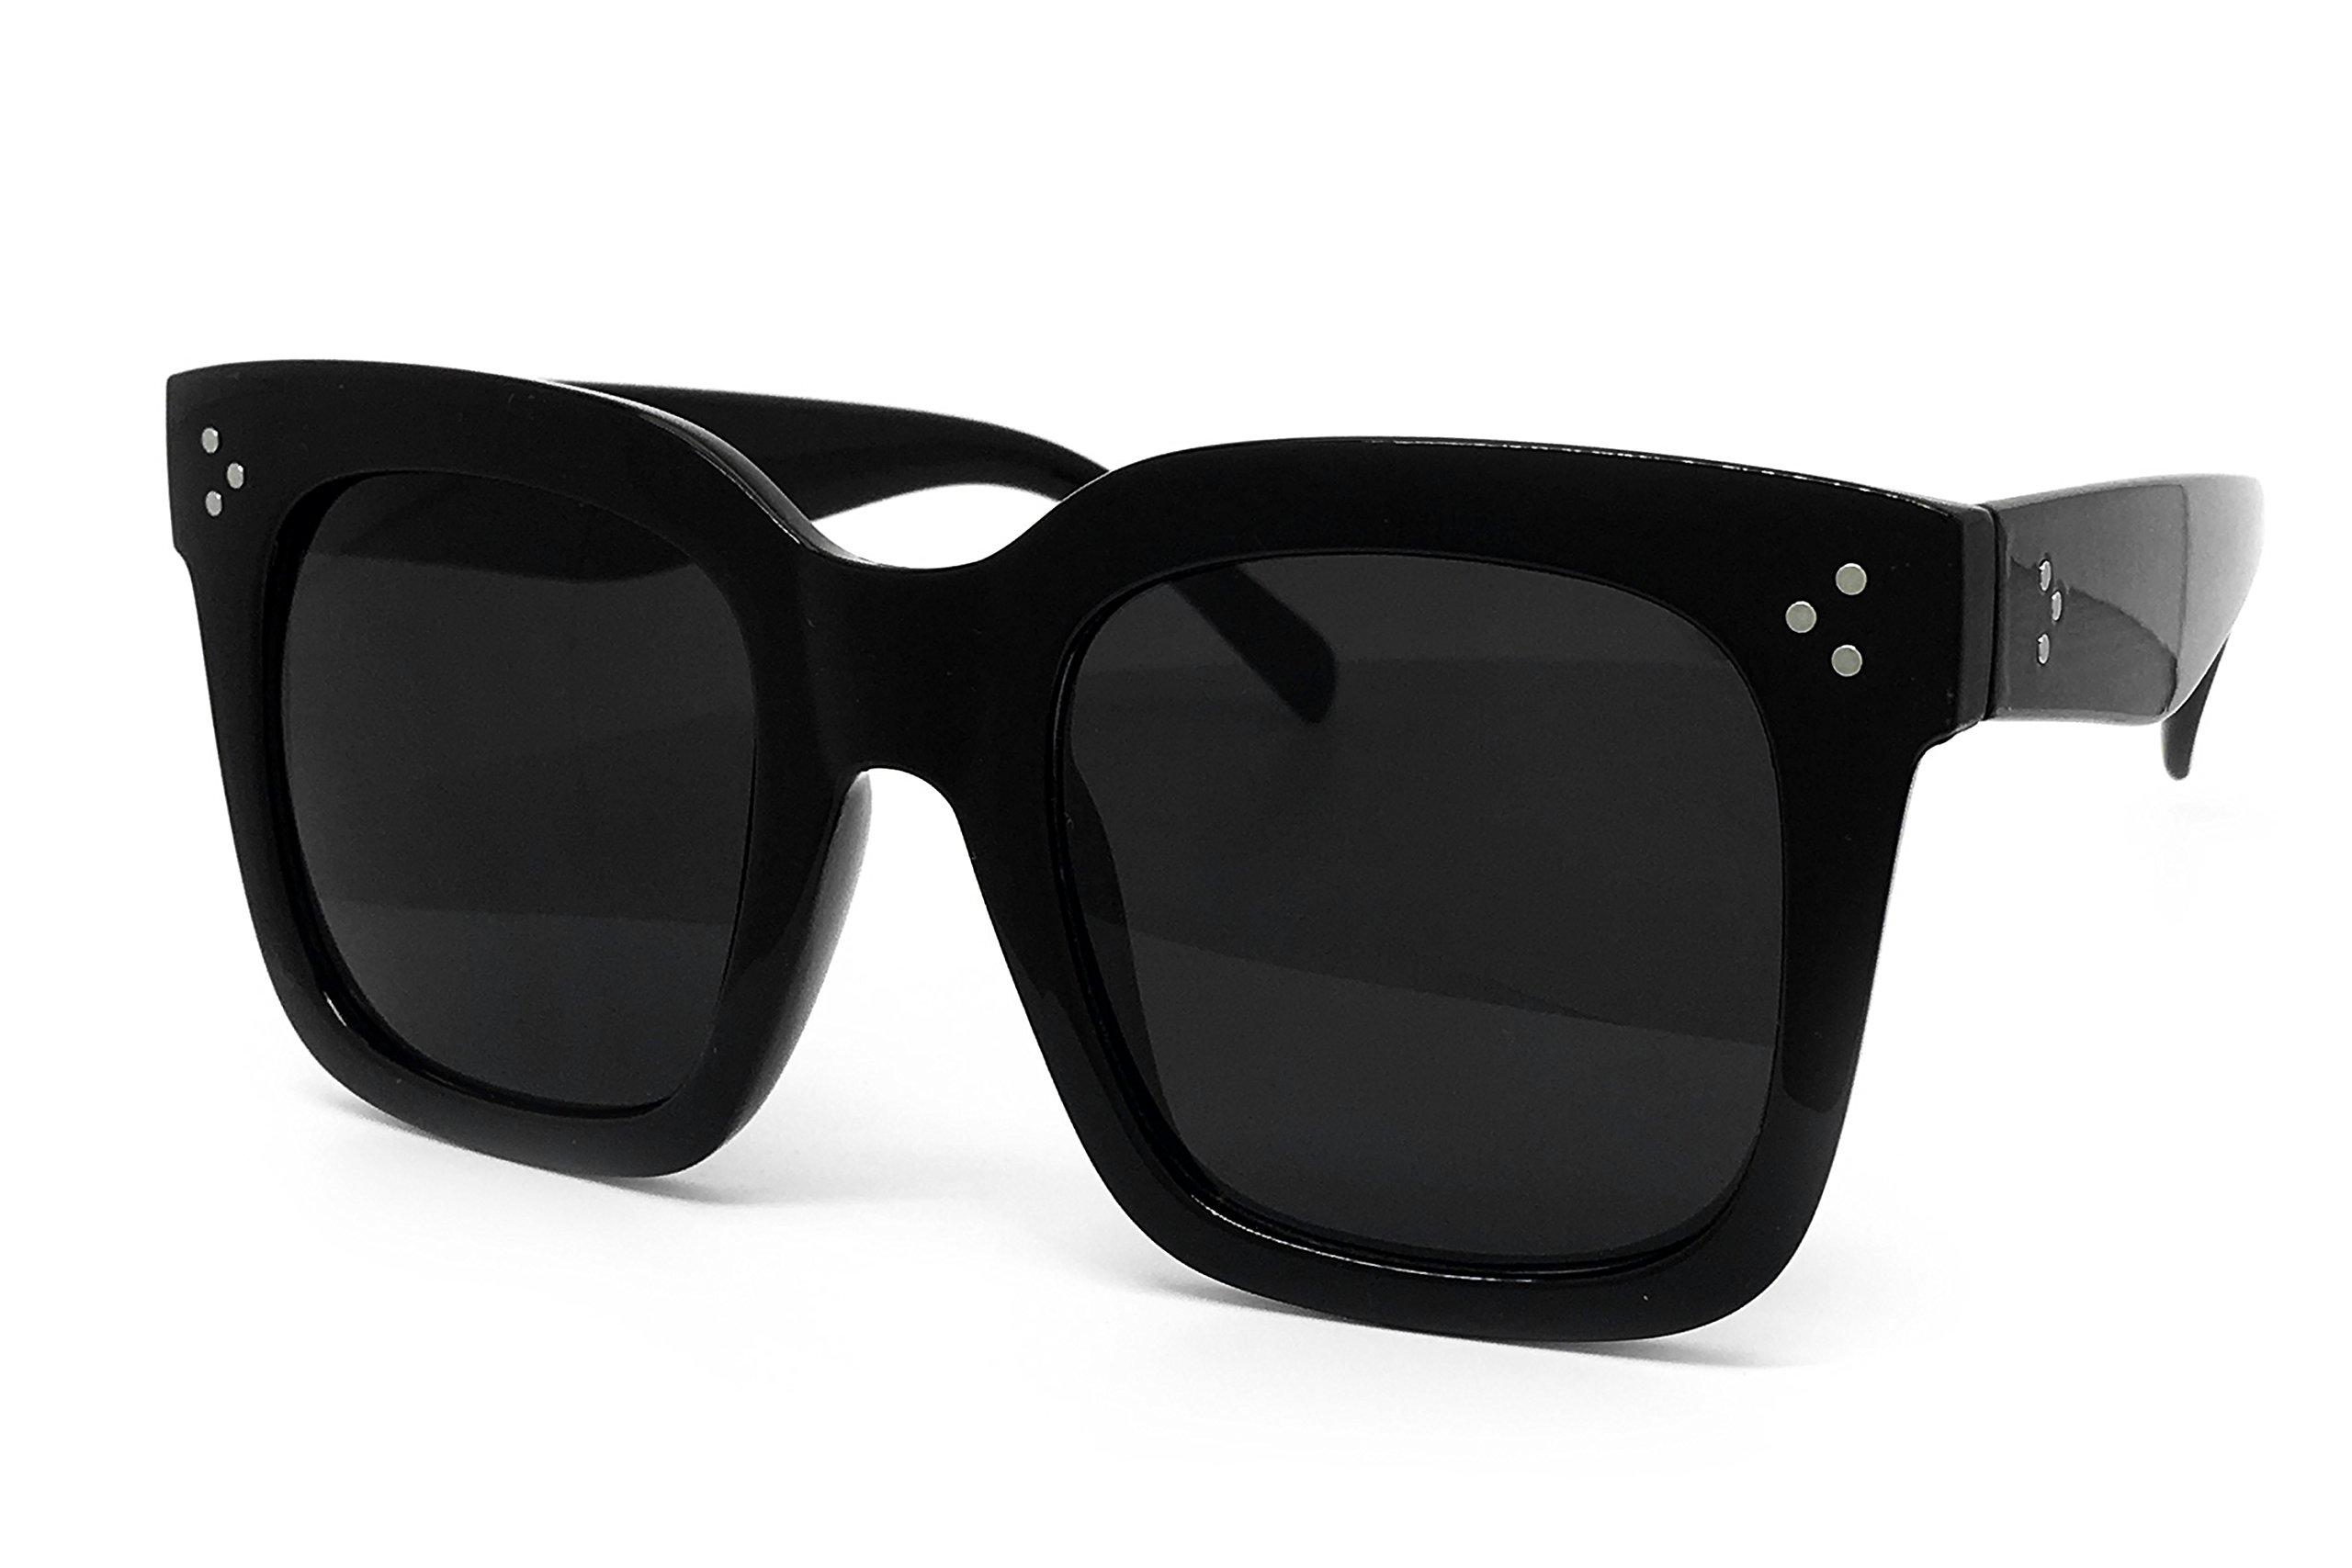 O2 Eyewear 7222 Premium Oversize XXL Women Men Mirror Revo Havana Tilda Shadow Style Fashion Sunglasses (SOLID BLACK, TILDA HAVANA)